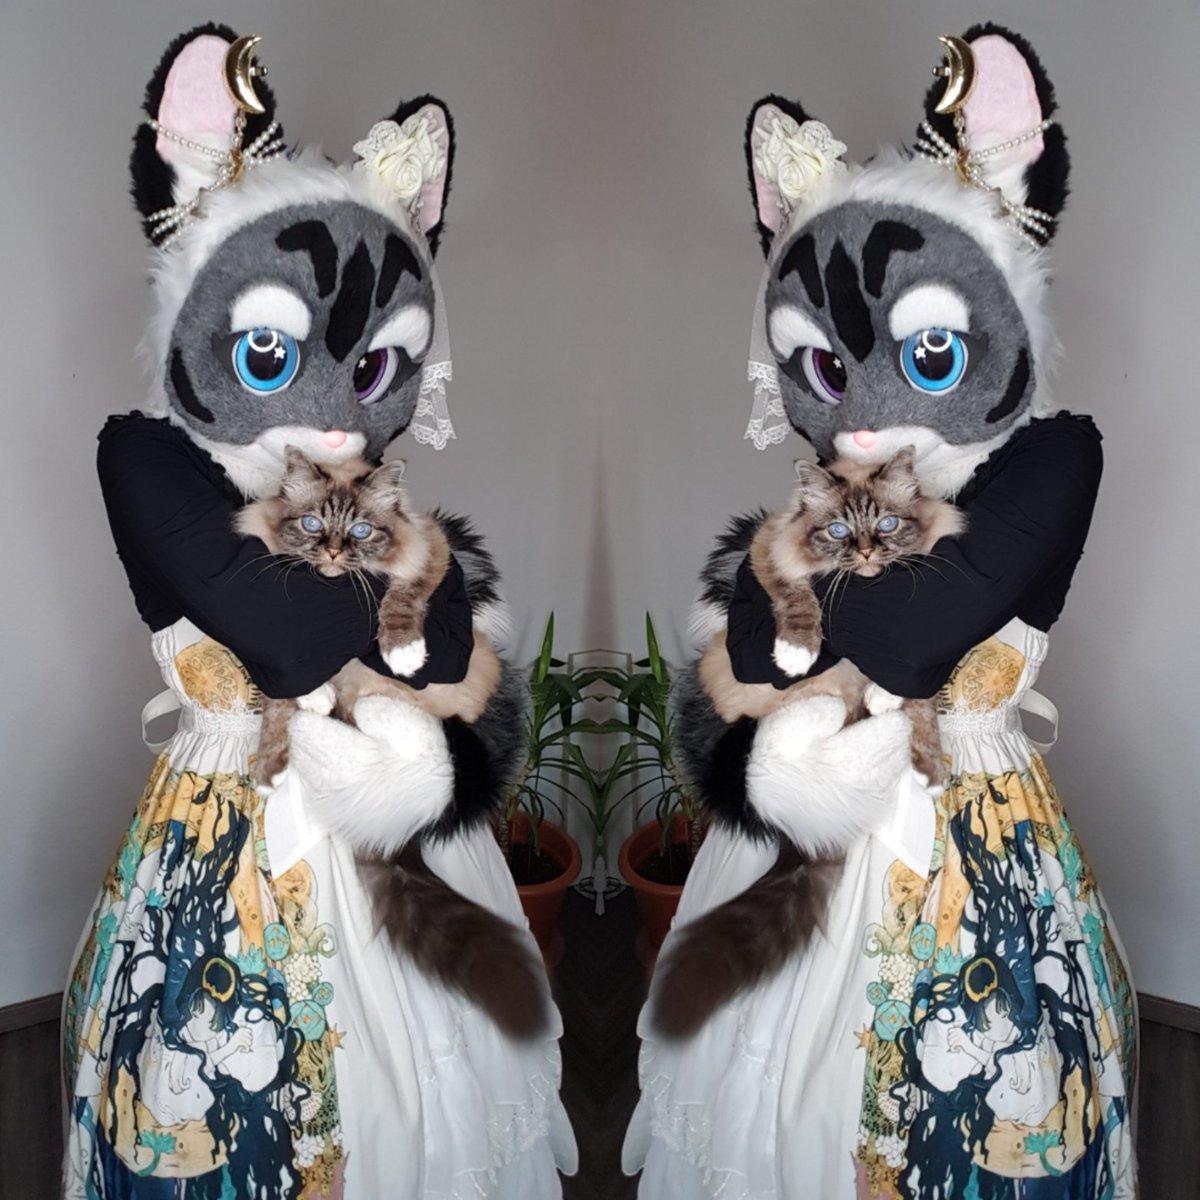 I love my cats 😋😽  Suit: @SchneeCreations  Dress: @nyanya_lolita    In my arms I hold my cat flummy. #birmacat #FursuitFriday #fursuit #lolita #lolitafashion #furry #furrygirl #kawaiineko